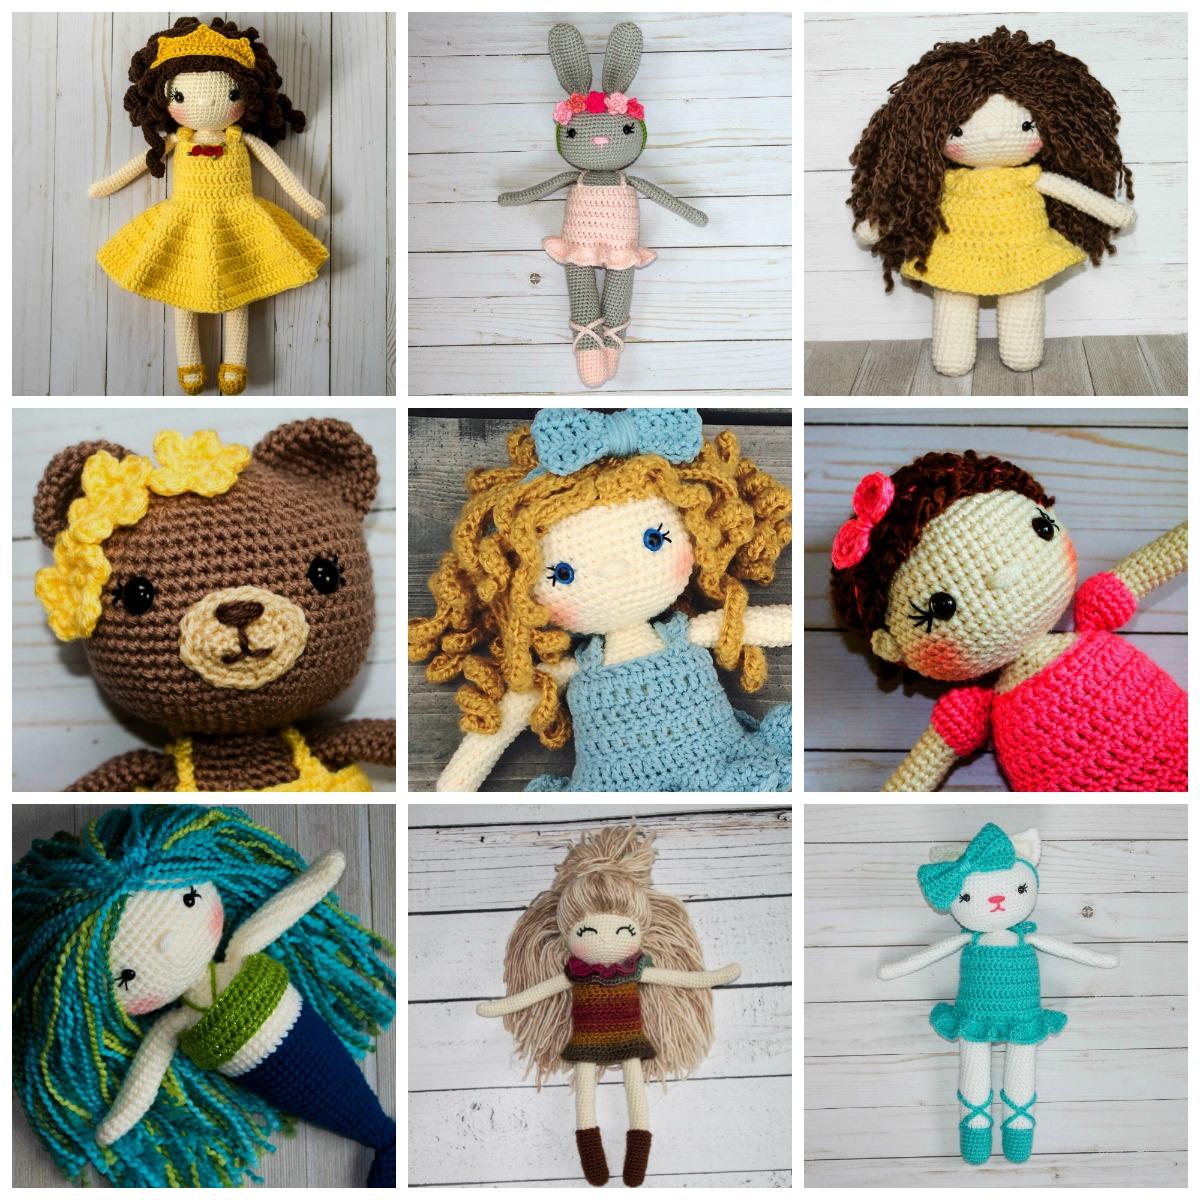 Free Crochet Amigurumi Doll Pattern (A Basic Crochet Doll Pattern ... | 1200x1200